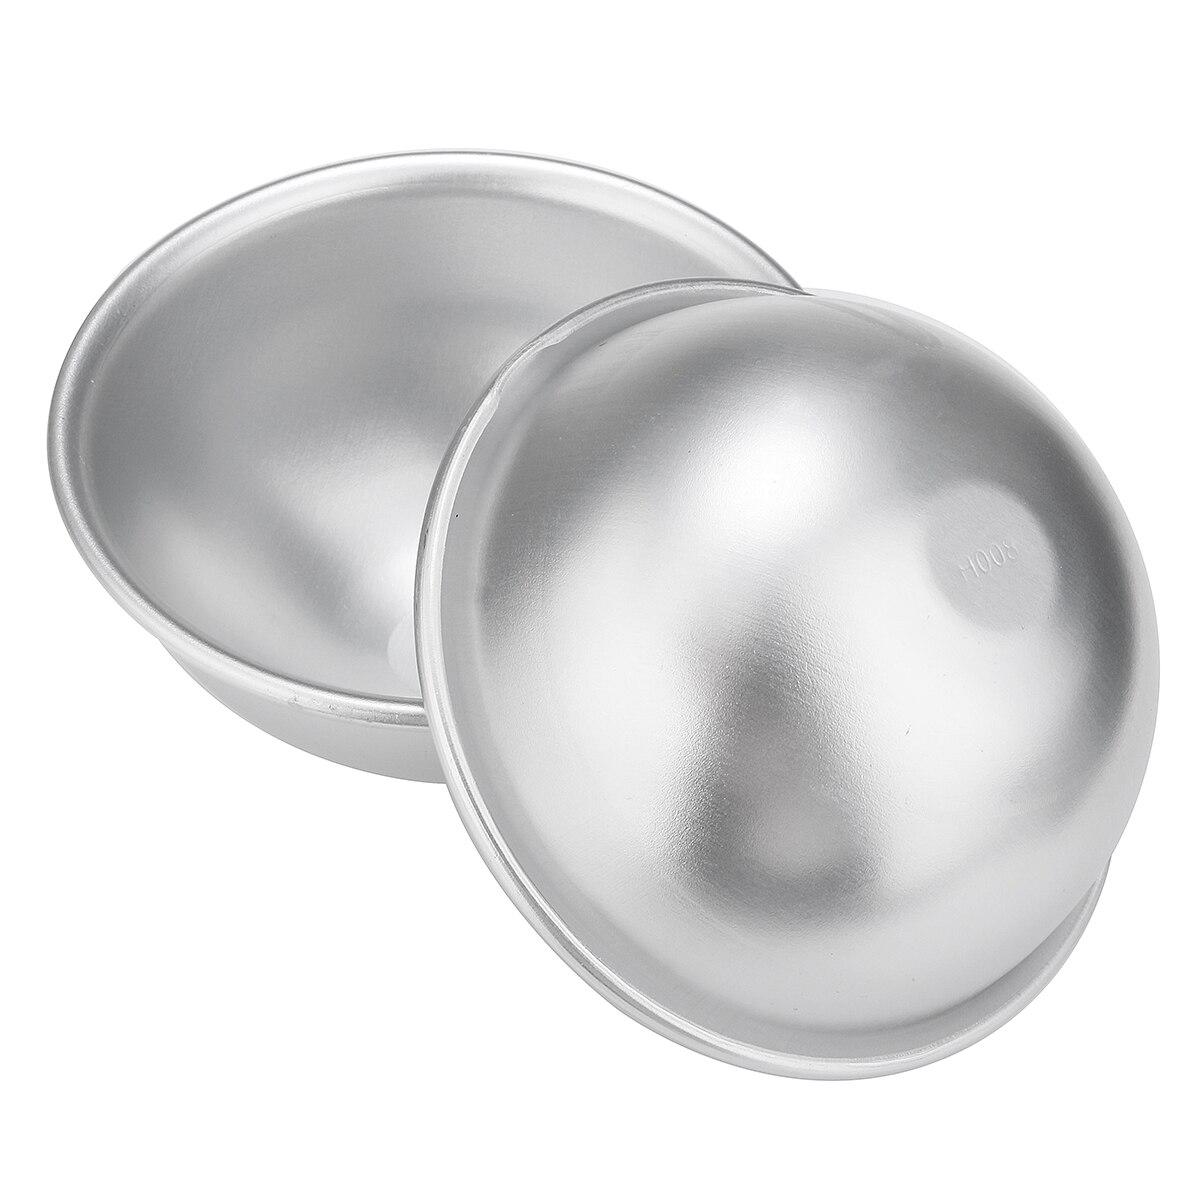 2/4/6pcs 8cm Bath Bomb Mold 3D Metal Aluminum Alloy Ball Sphere Shape Bath Salt Bomb Handmade DIY Bathing Salt Making Tools